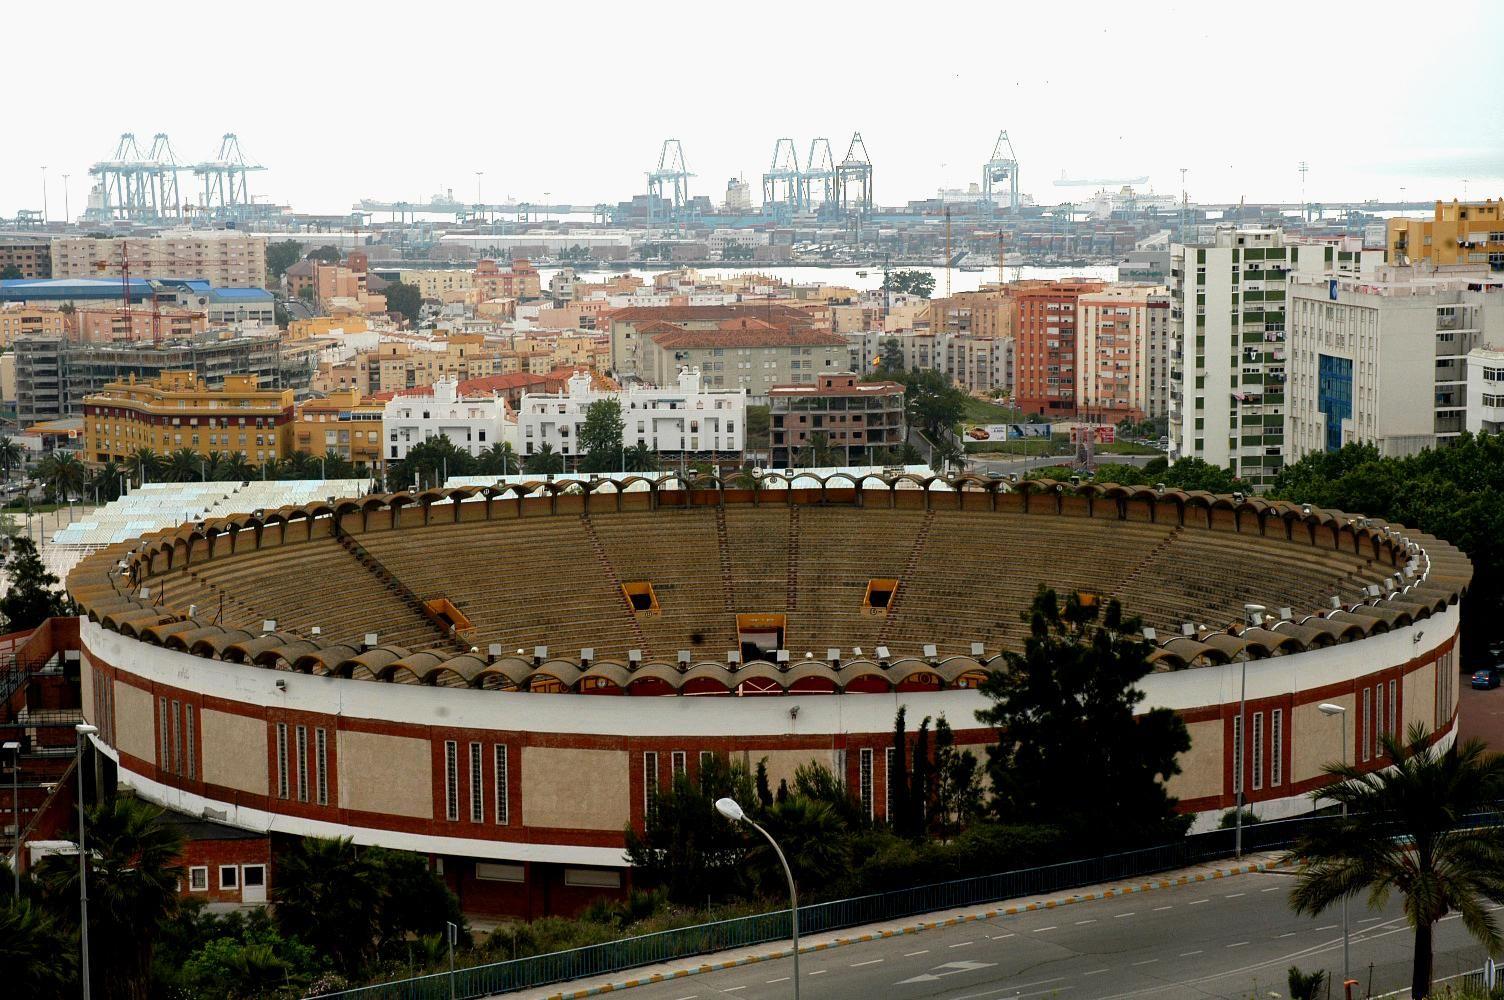 Plaza de toros de Algeciras